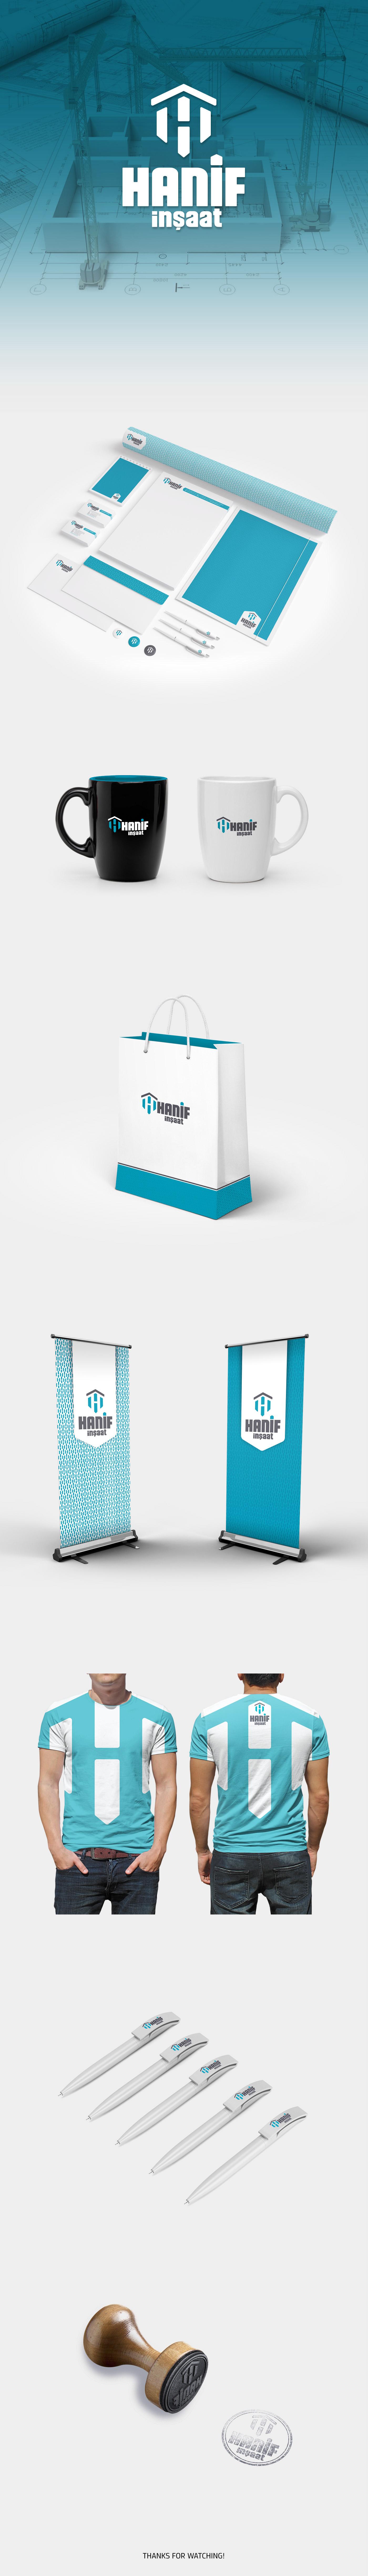 logo corporate brand building kurumsal marka inşaat poster rollup Mug  brochure Afiş broşür